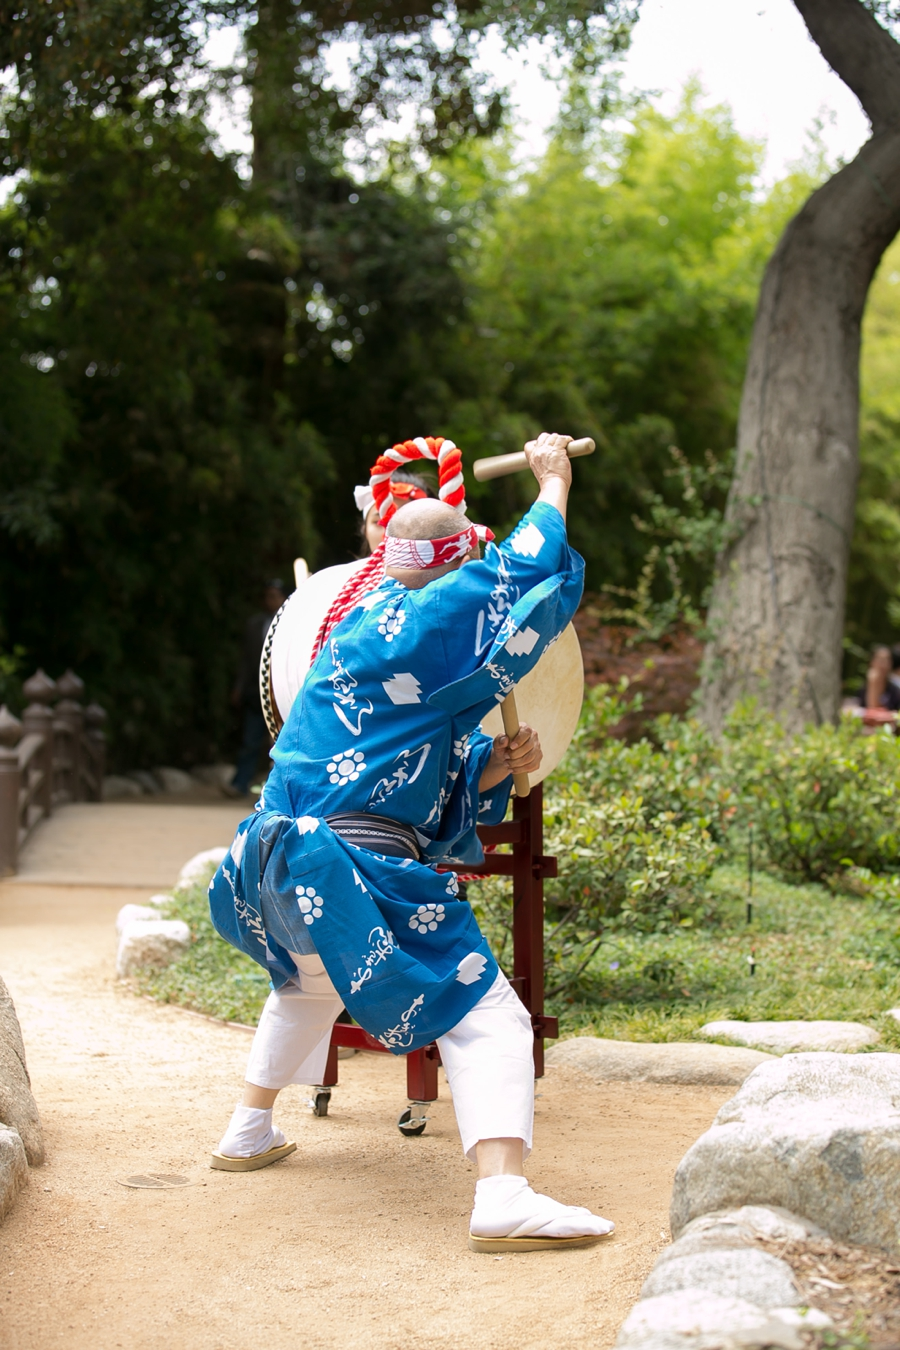 Storrier-Stearns Japanese Garden PASADENA WEDDING PHOTOGRAPHER CHRIS HOLT PHOTOGRAPHY_030.jpg